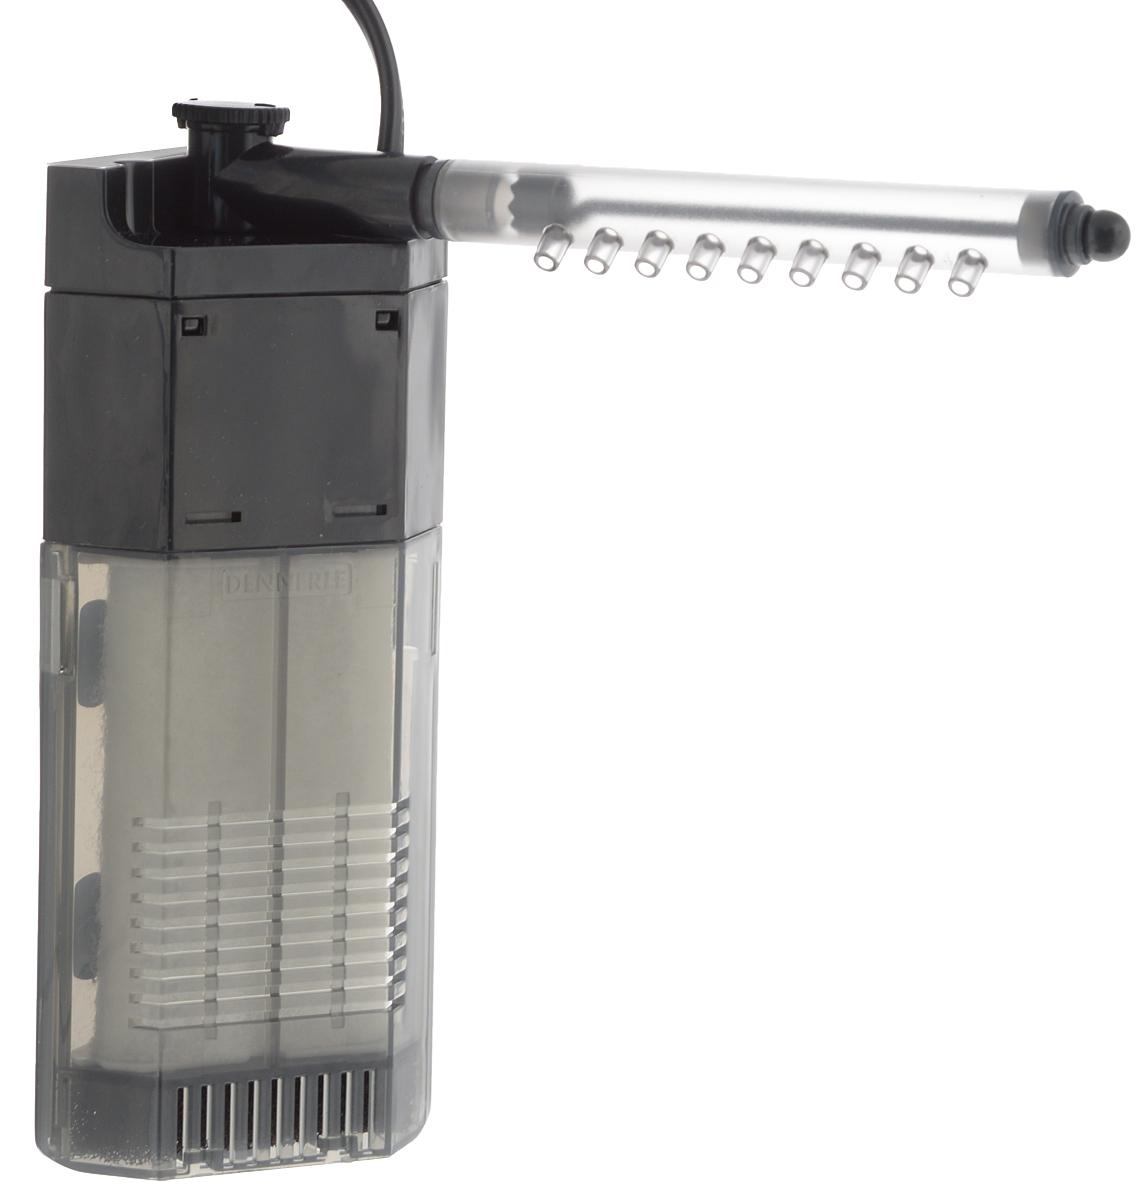 Фильтр для аквариумов Dennerle Nano Clean Eckfilter, угловой, 150 л/ч, 2 Вт defender sorbonne c 835 nano